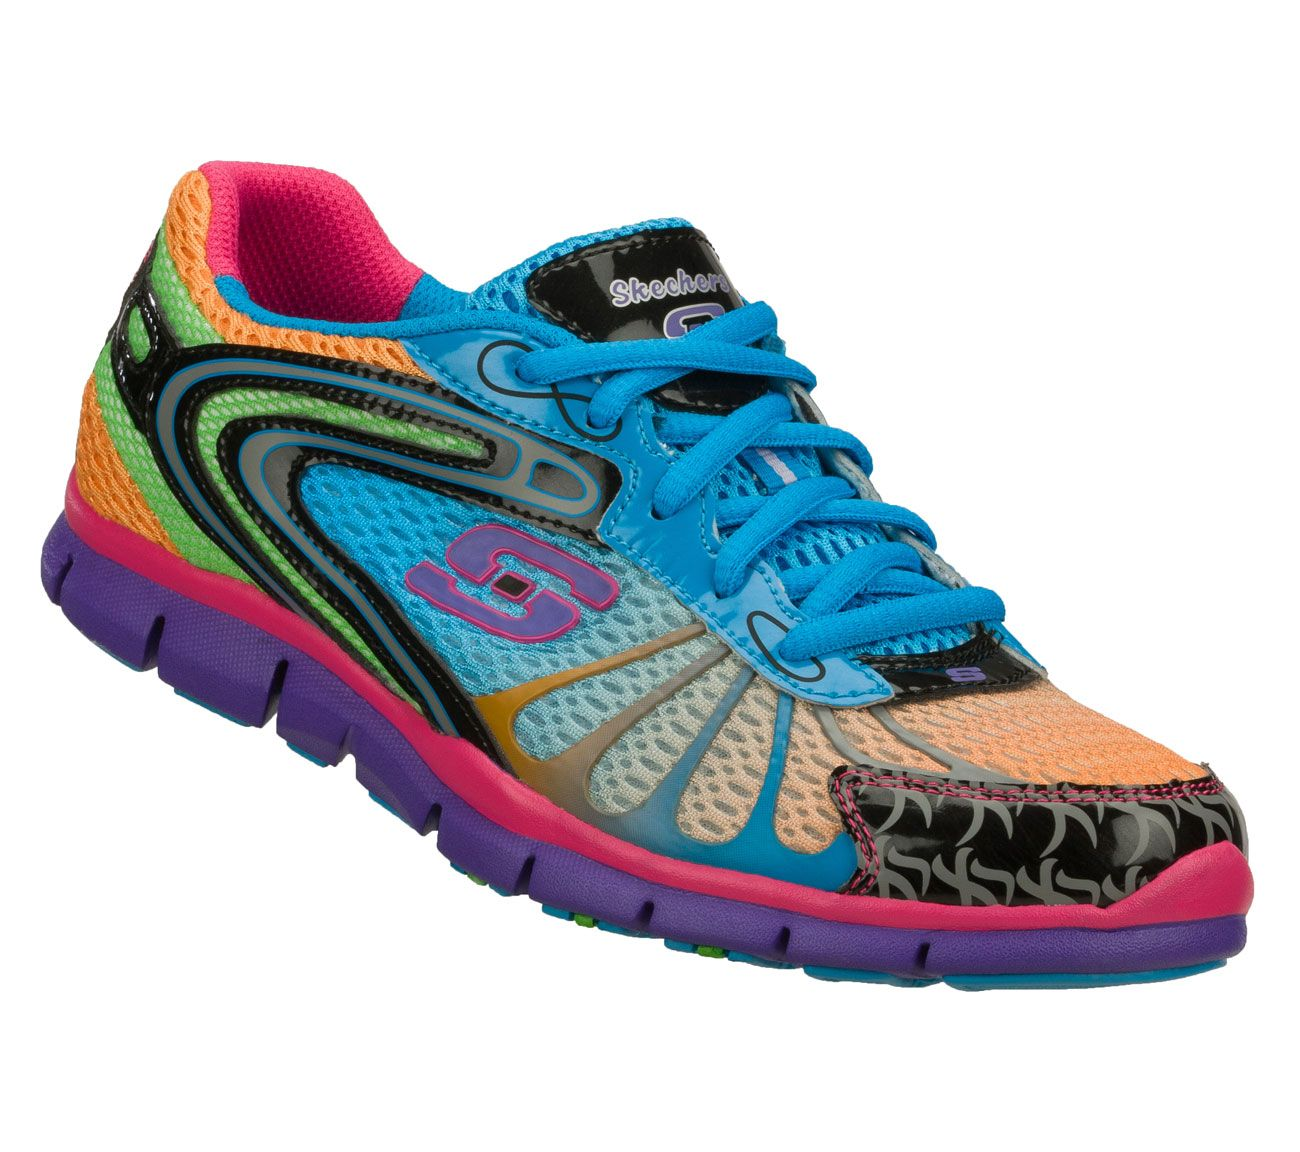 Damen Skechers Gratis Running Wild Multi Athletic Schuhe